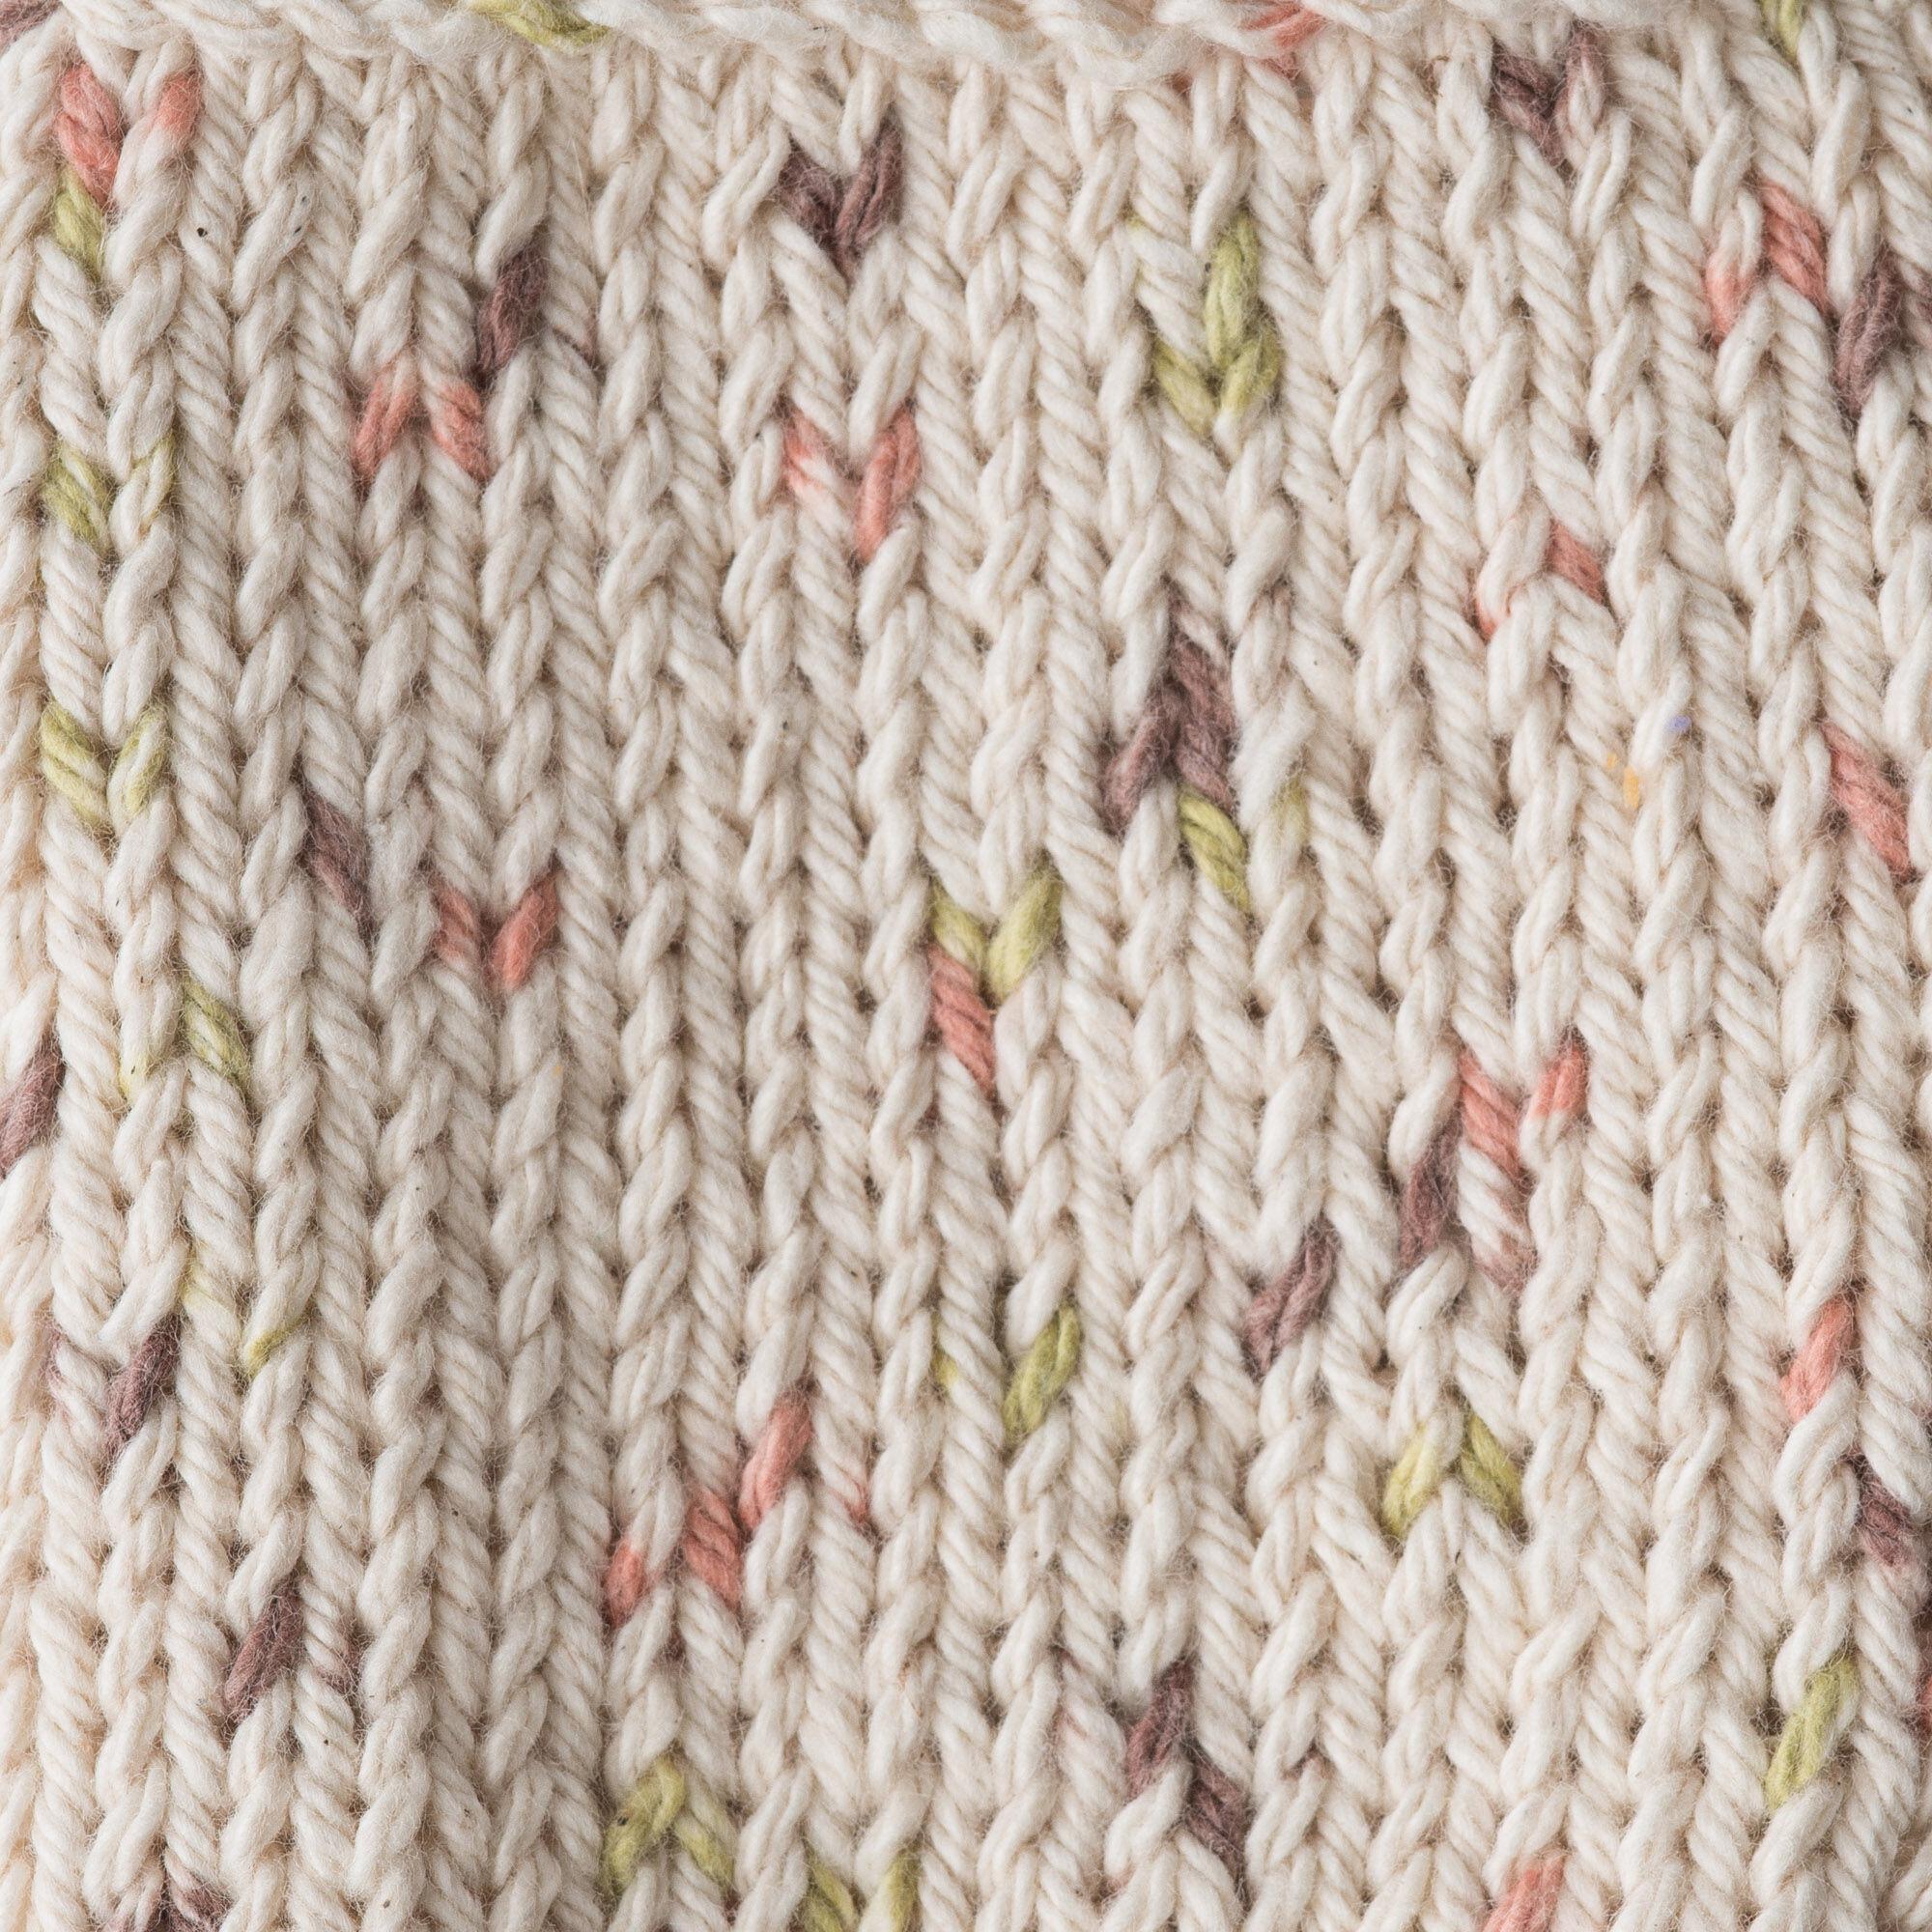 Lily Sugar'n Cream Big Ball Ombres Yarn, Sonoma Print | Yarnspirations